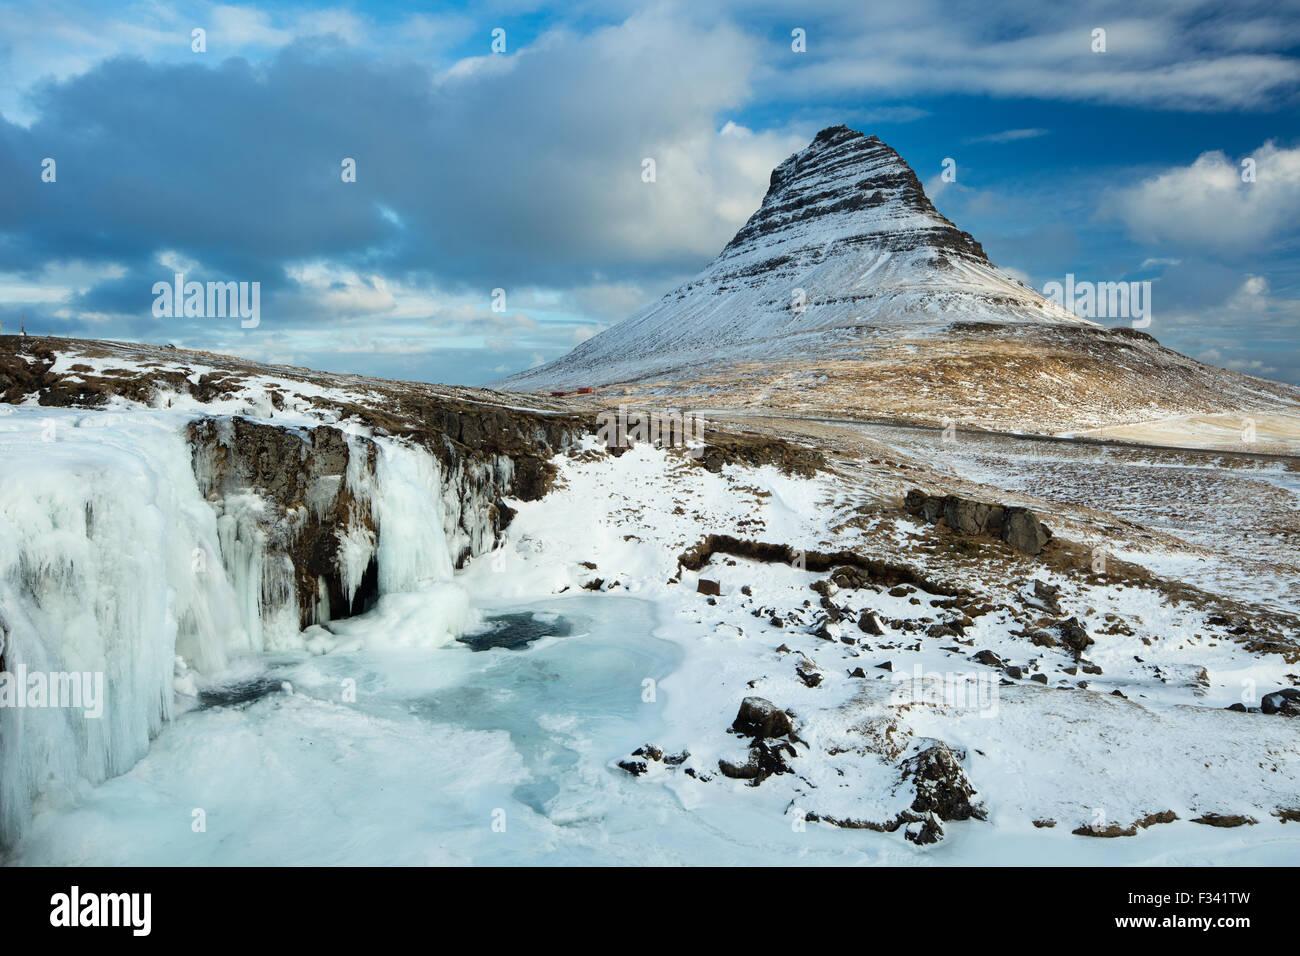 snowclad Kirkjufell, Snaefellsness Peninsula, Iceland - Stock Image